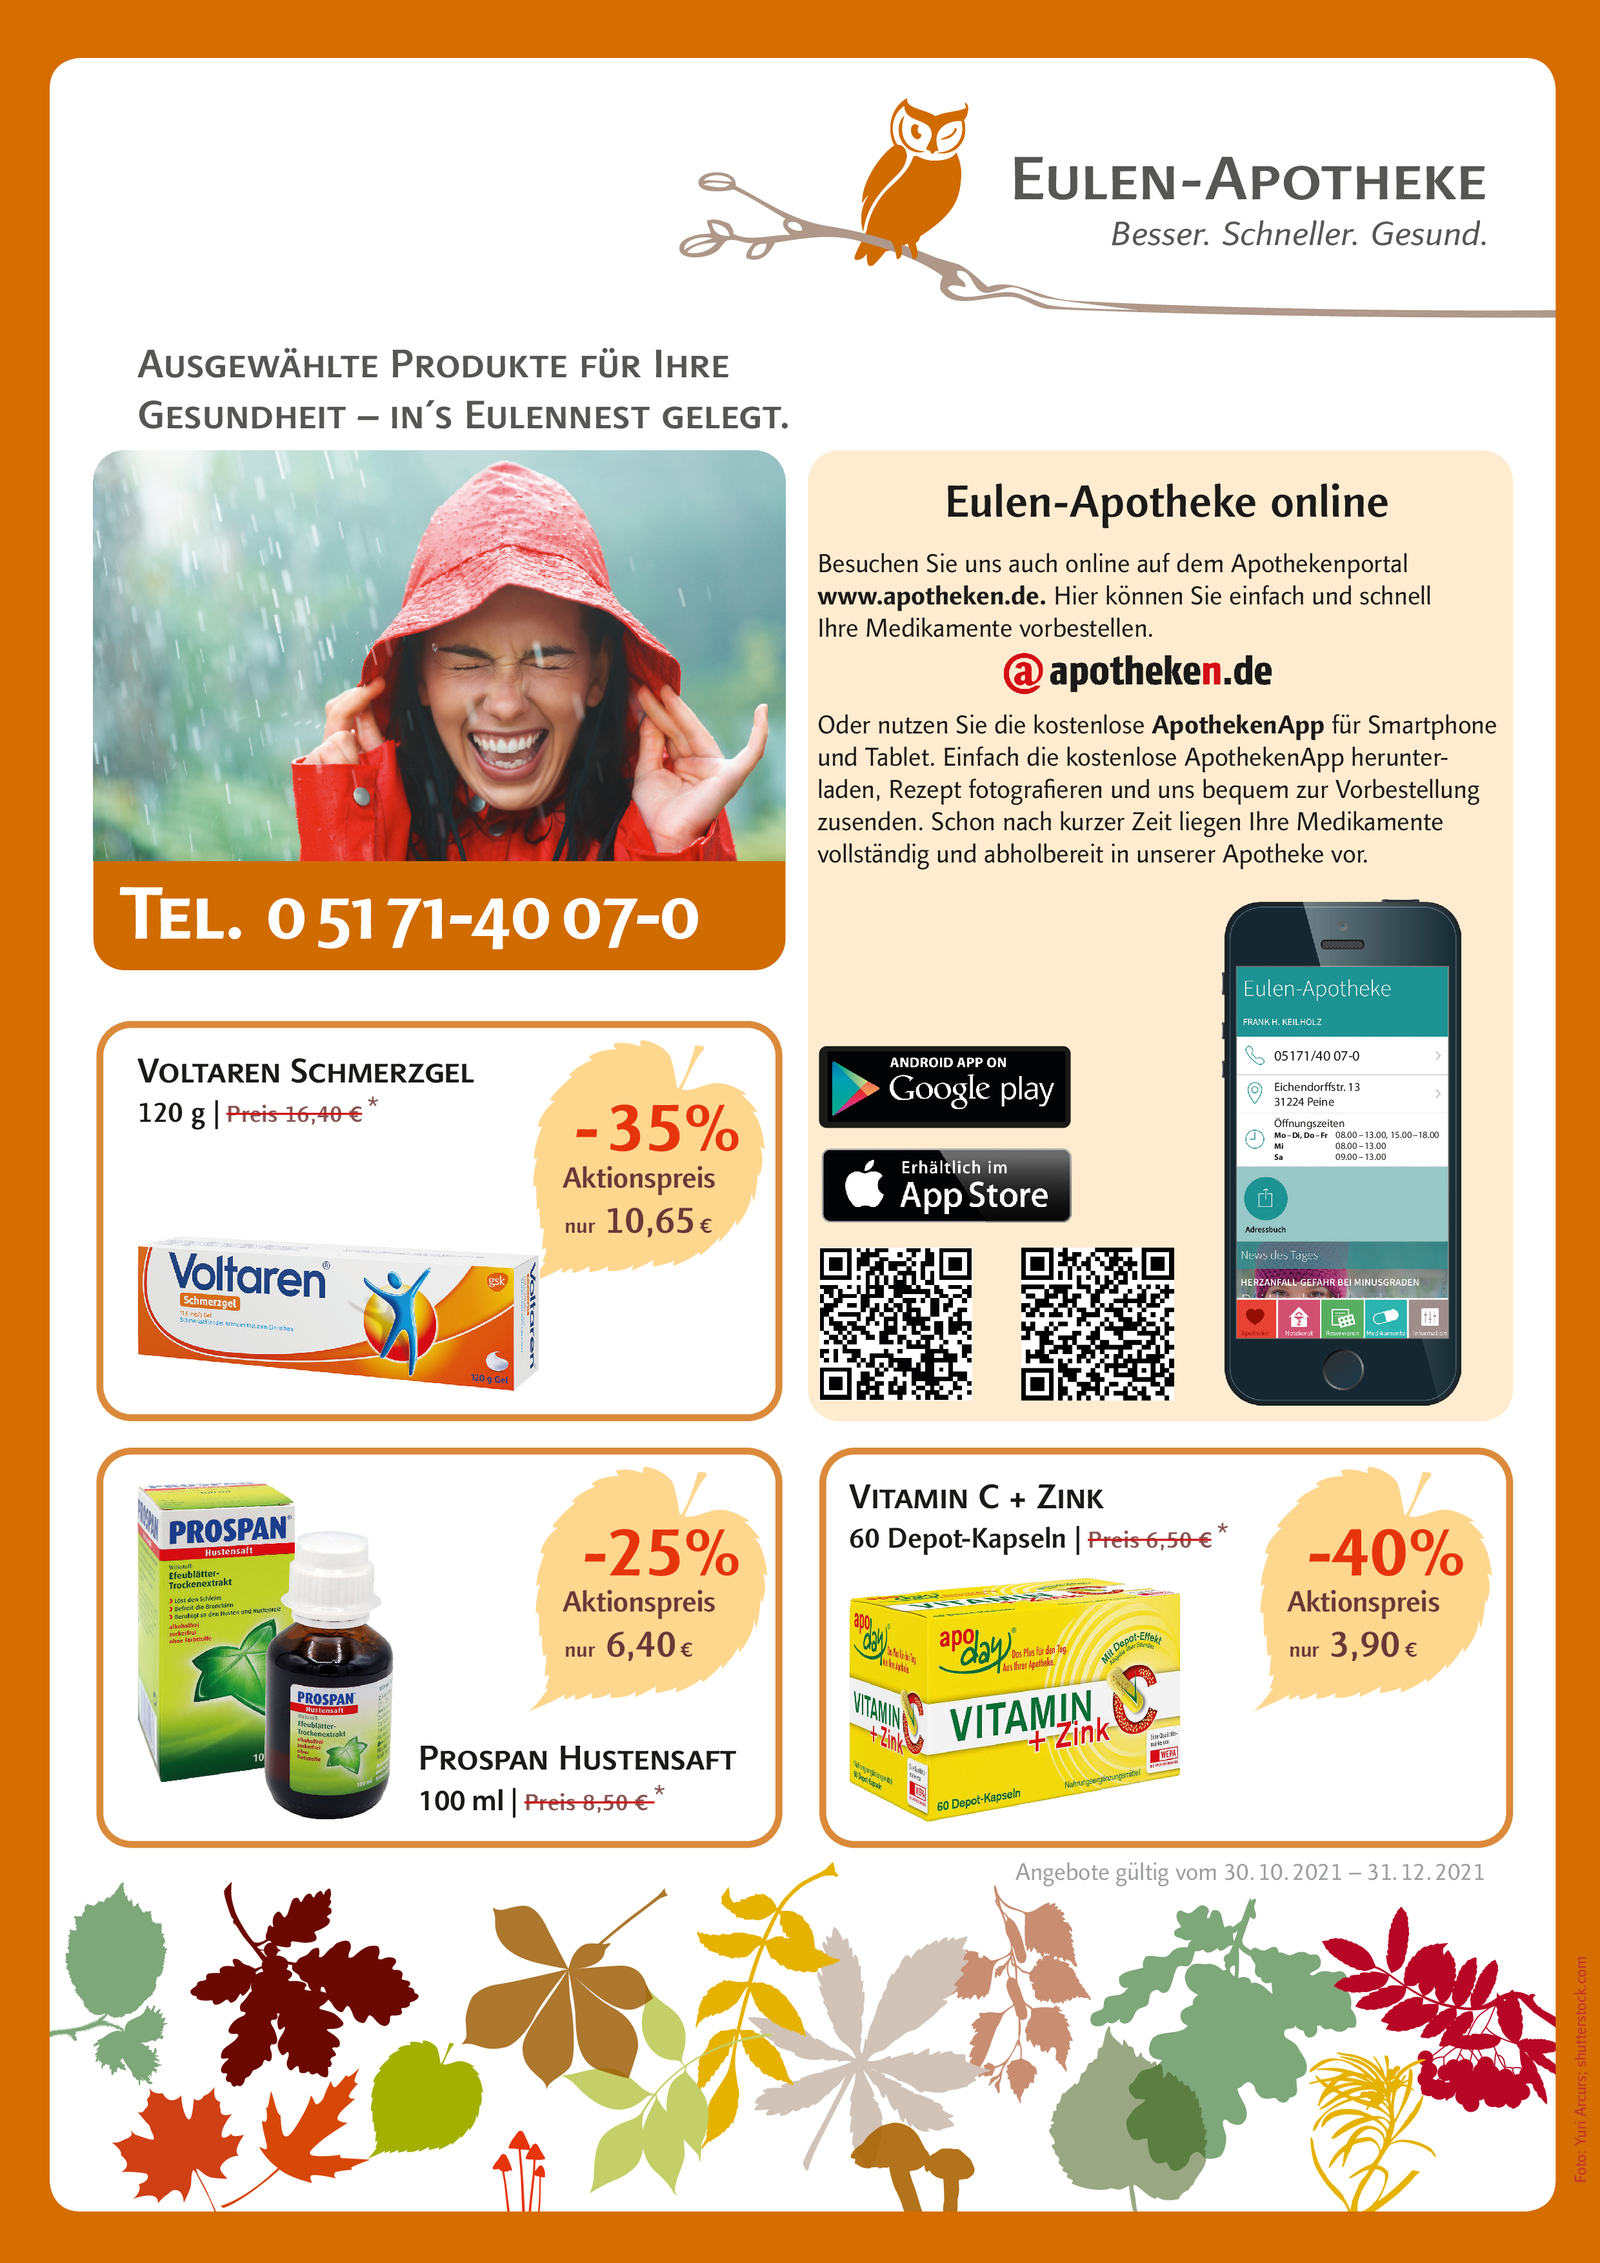 https://mein-uploads.apocdn.net/15573/leaflets/15573_flyer-Seite1.png